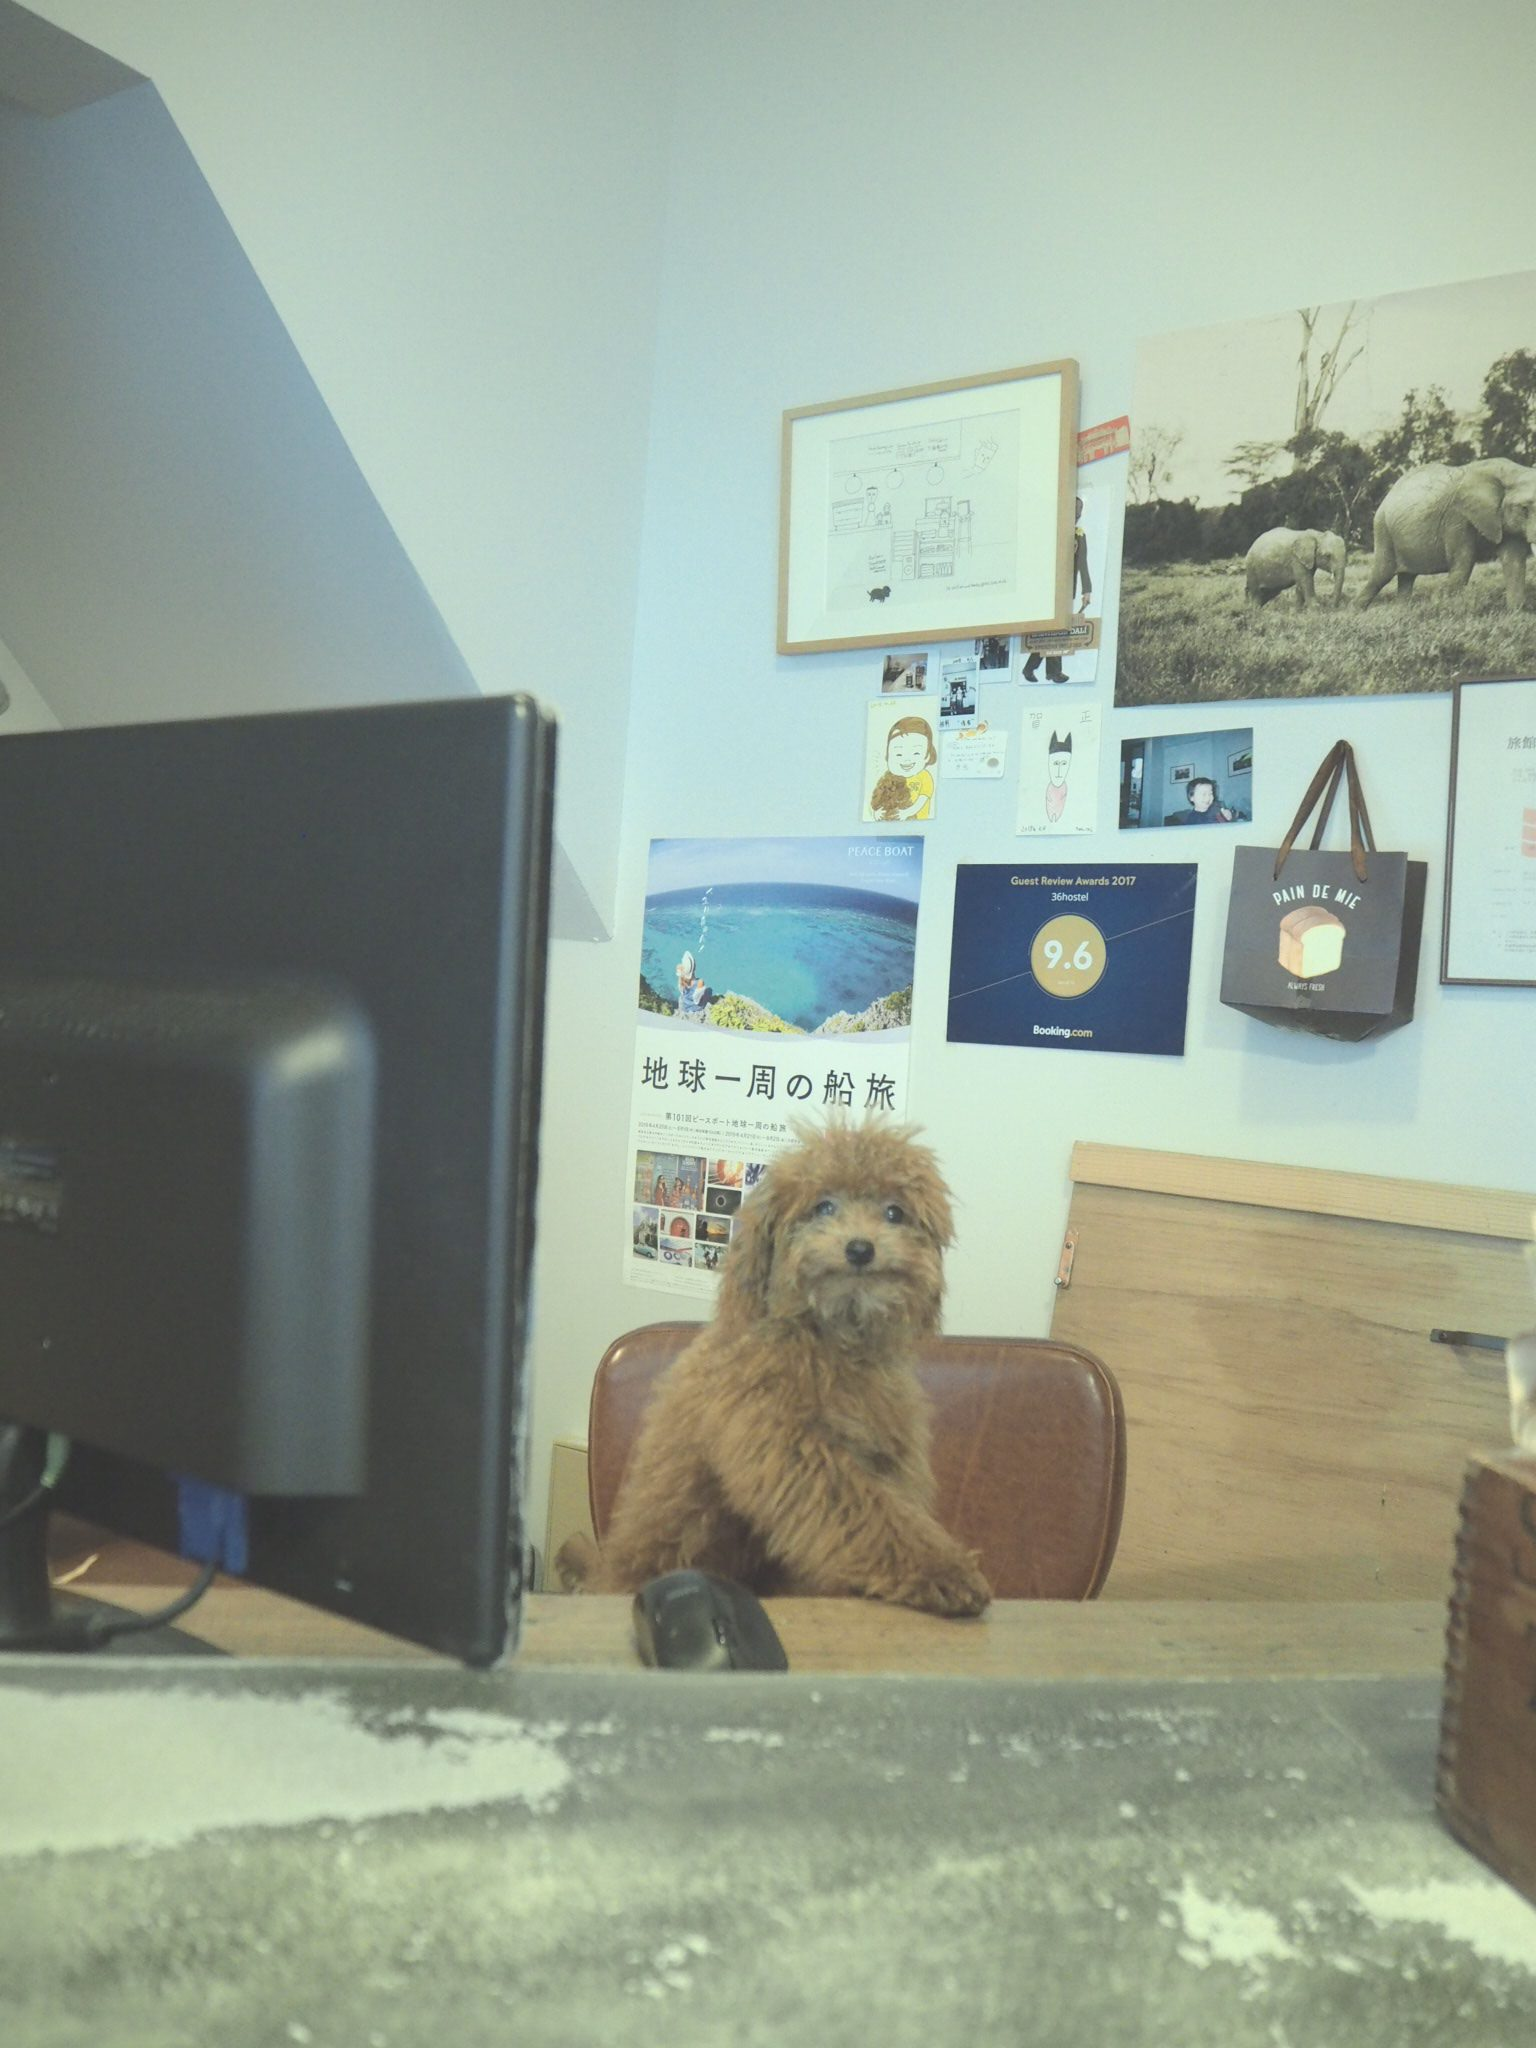 New receptionist